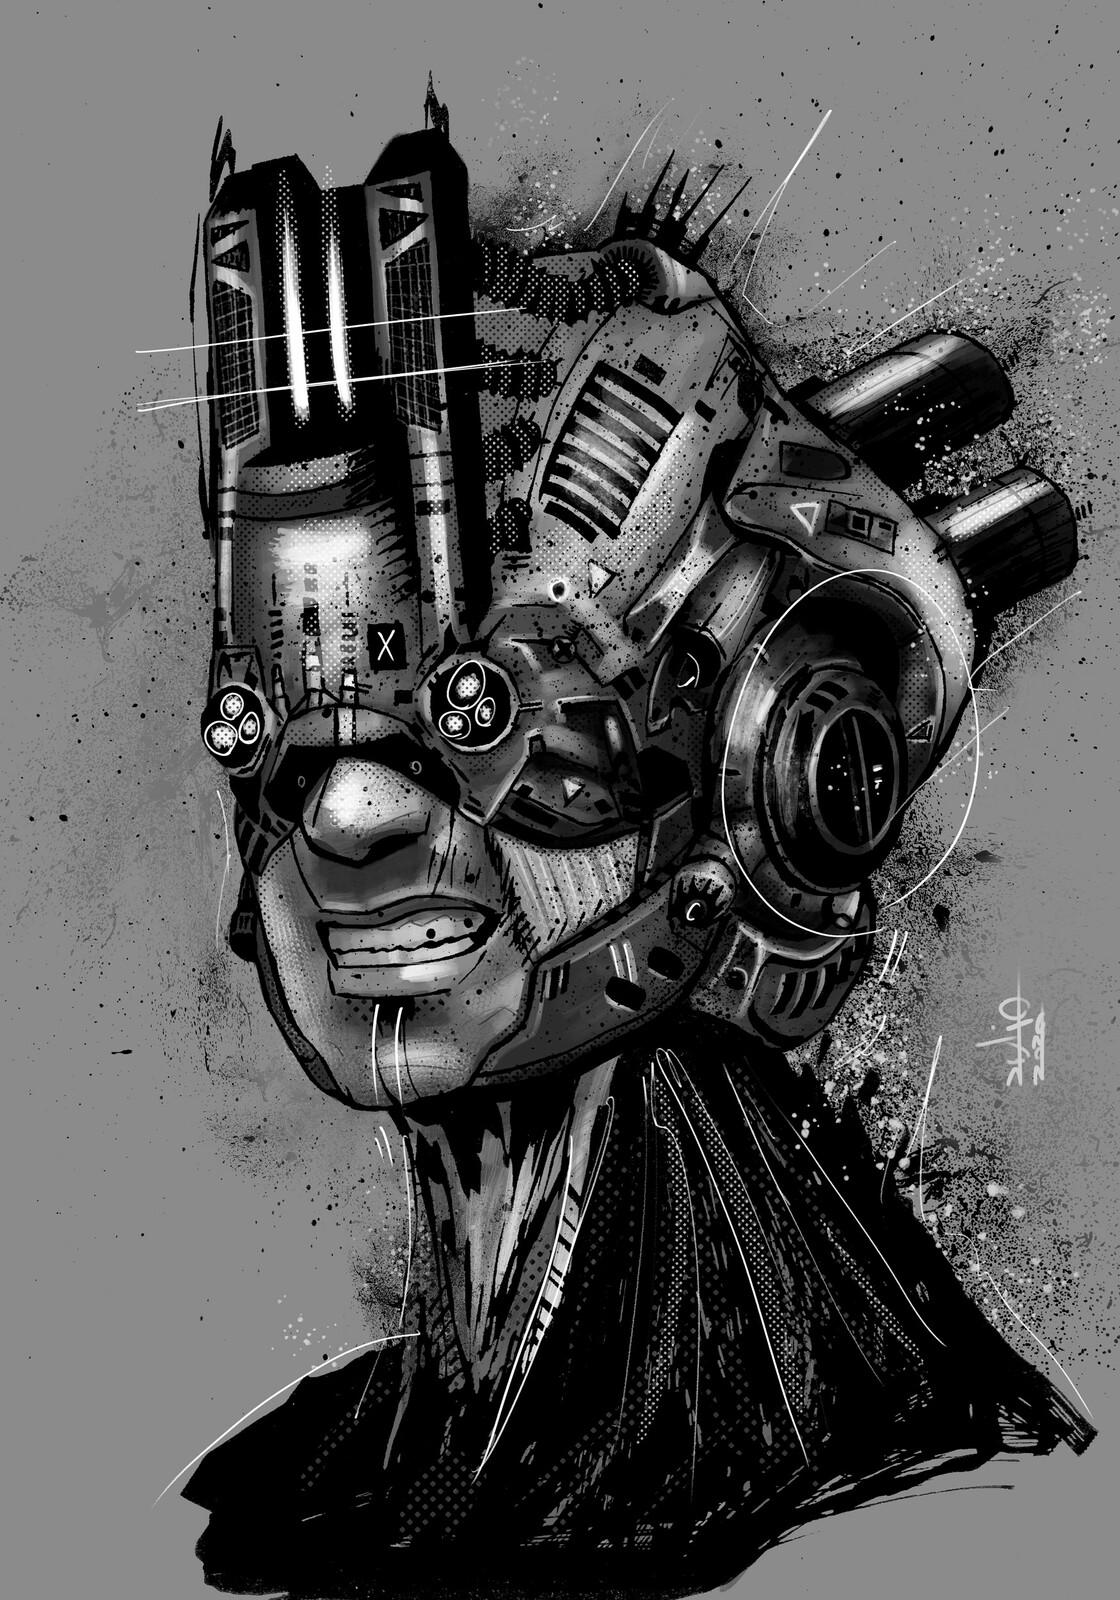 Lz Face 006